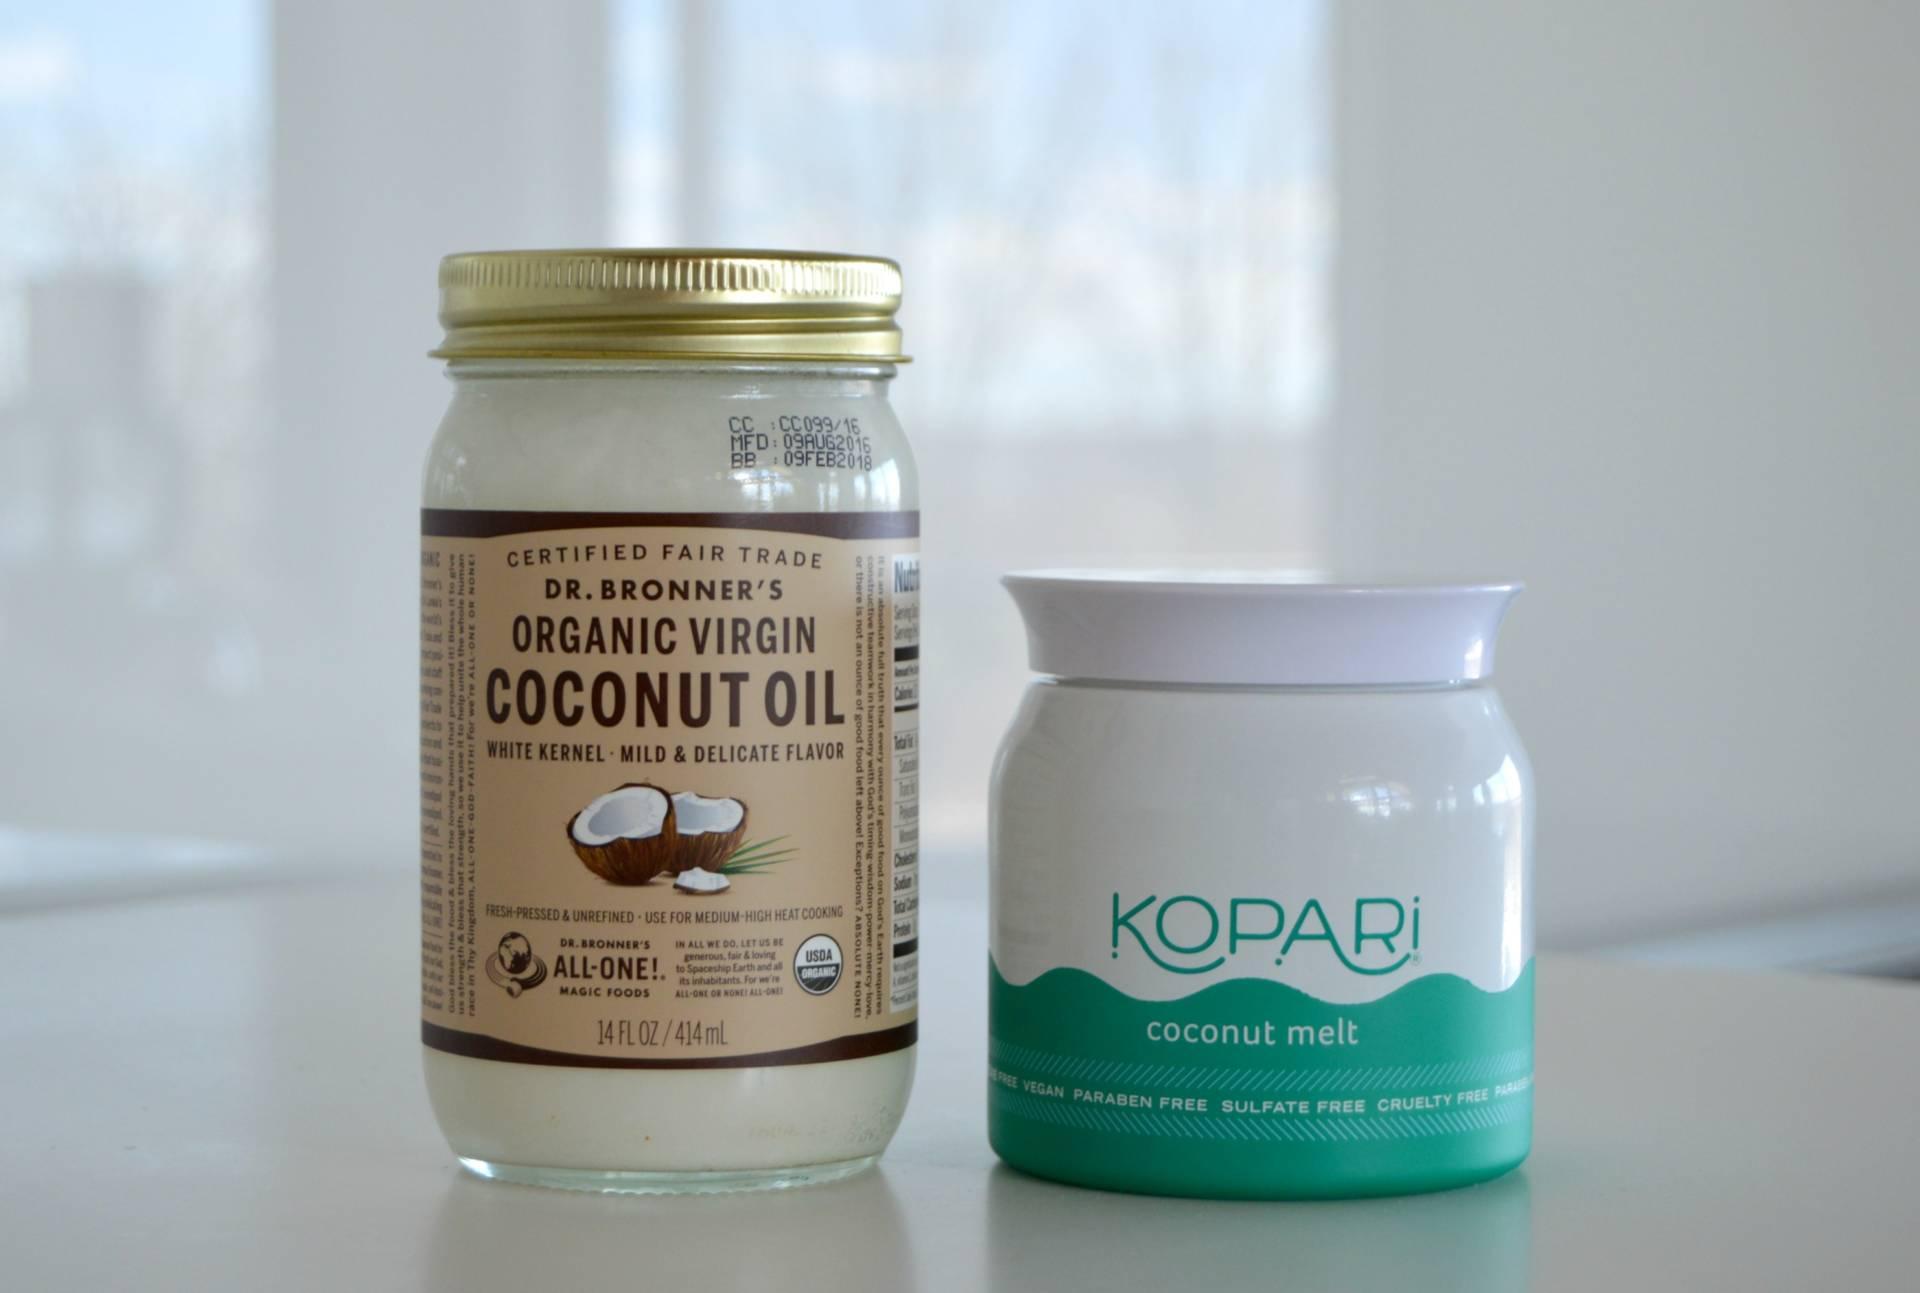 kopari-coconut-melt-vs-supermarket-oil-comparison-review-omgbart.jpg